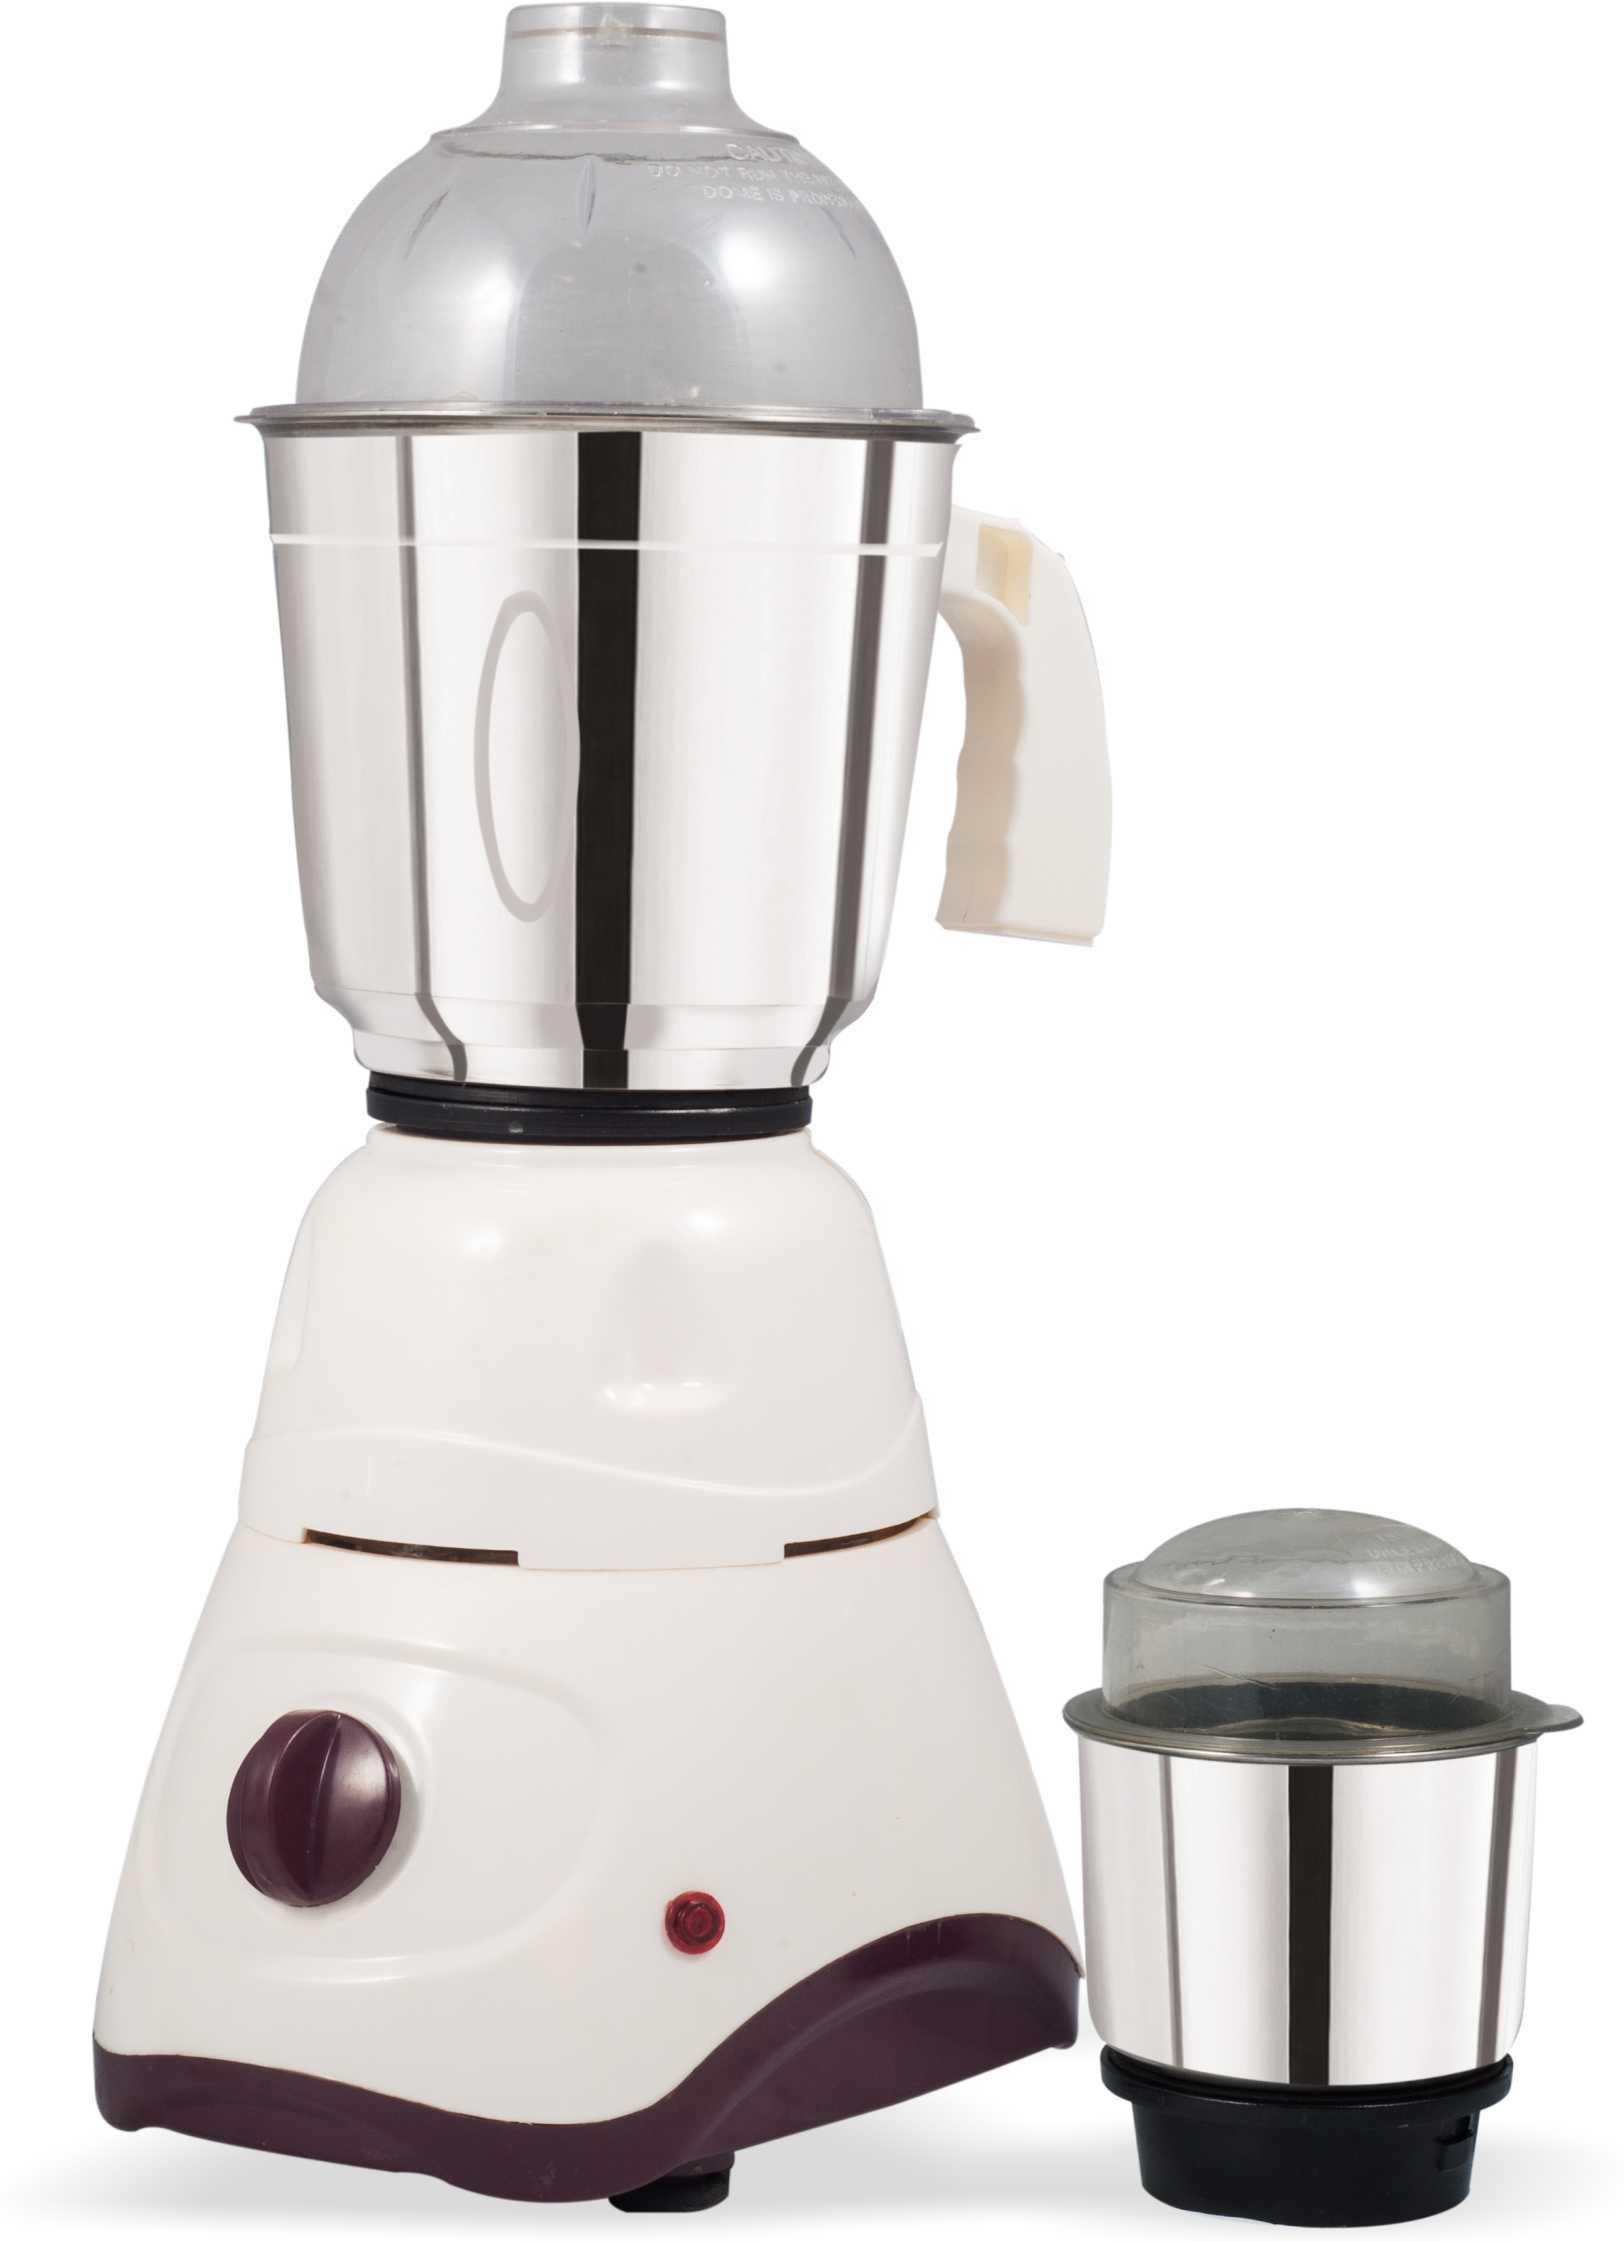 Sphere TURBO 450 W Mixer Grinder(White, Ivory, 2 Jars)